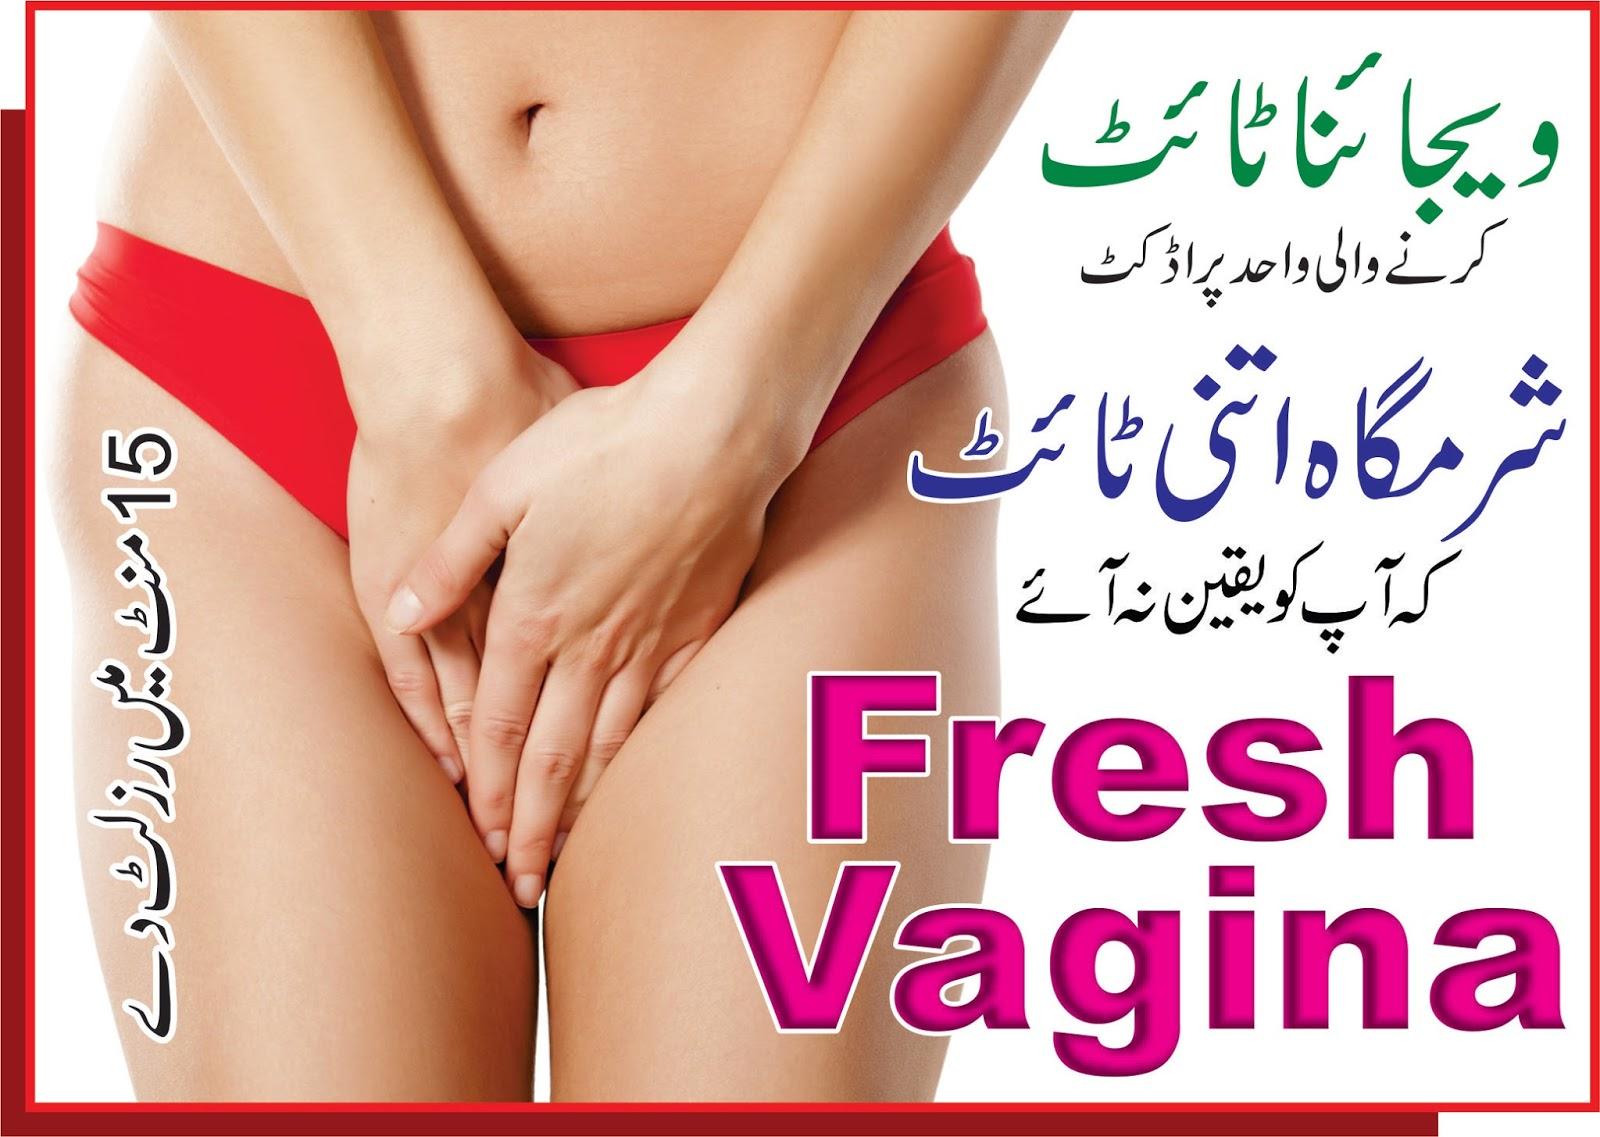 Širitev penisa penis širitev krema v Pakistanu-1080